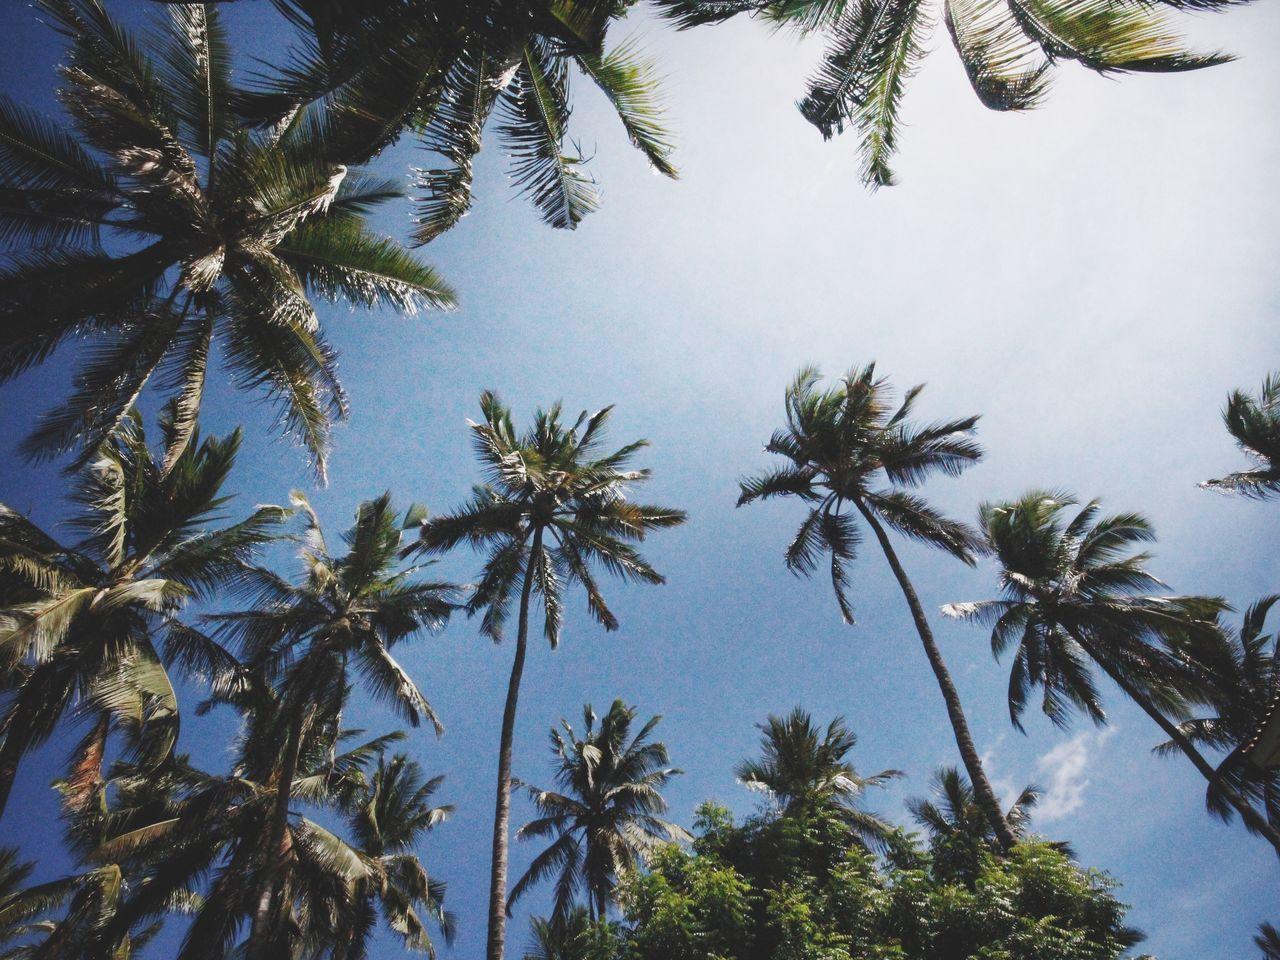 The delights of Watamu - Palm Tree Wideangle Canonphotography Canon60d Tranquility Bestoftheday BestofEyeEm Watamu Kenya Indian Ocean Kenyancoast Sallystevens Tree KeeplookingUp Excotic